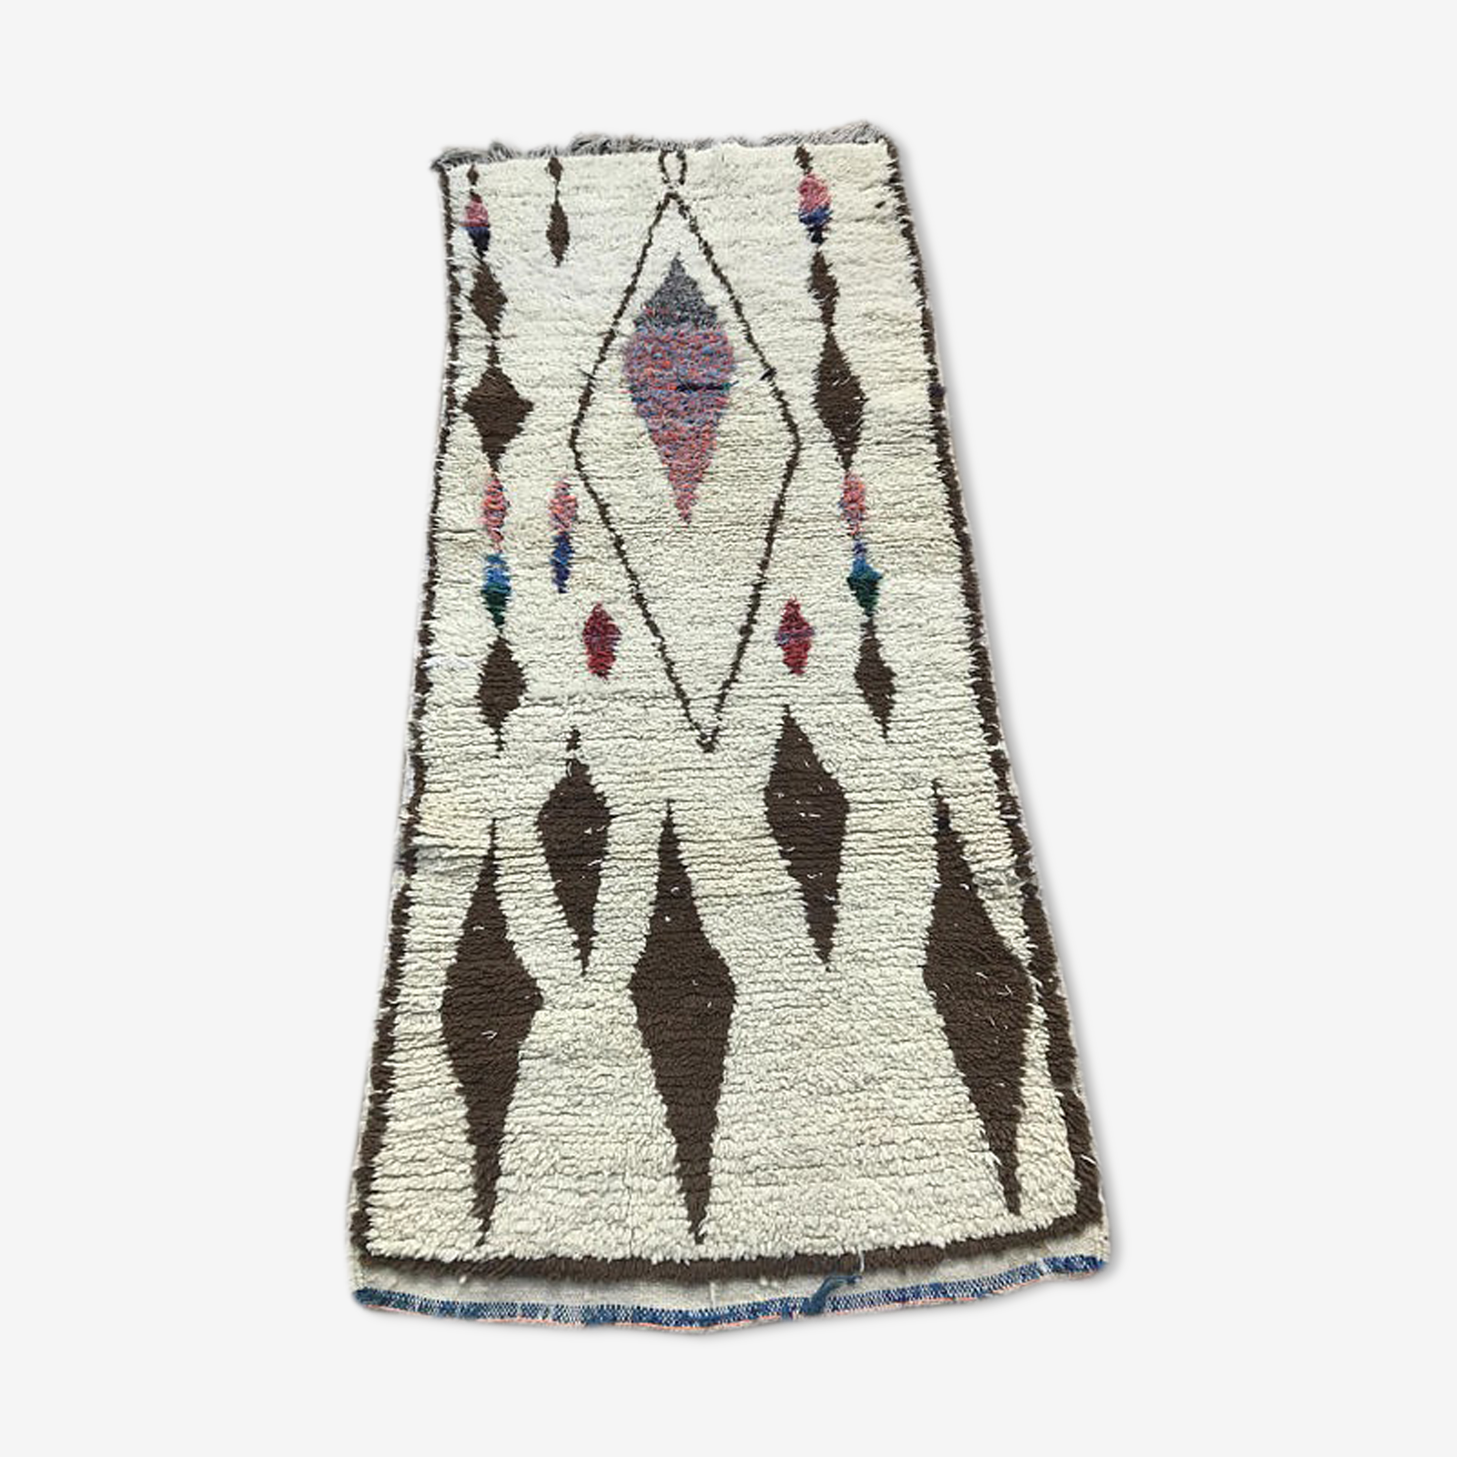 Tapis Berbere Azilal 210x85cm Wool Cotton Multicolour Ethnic